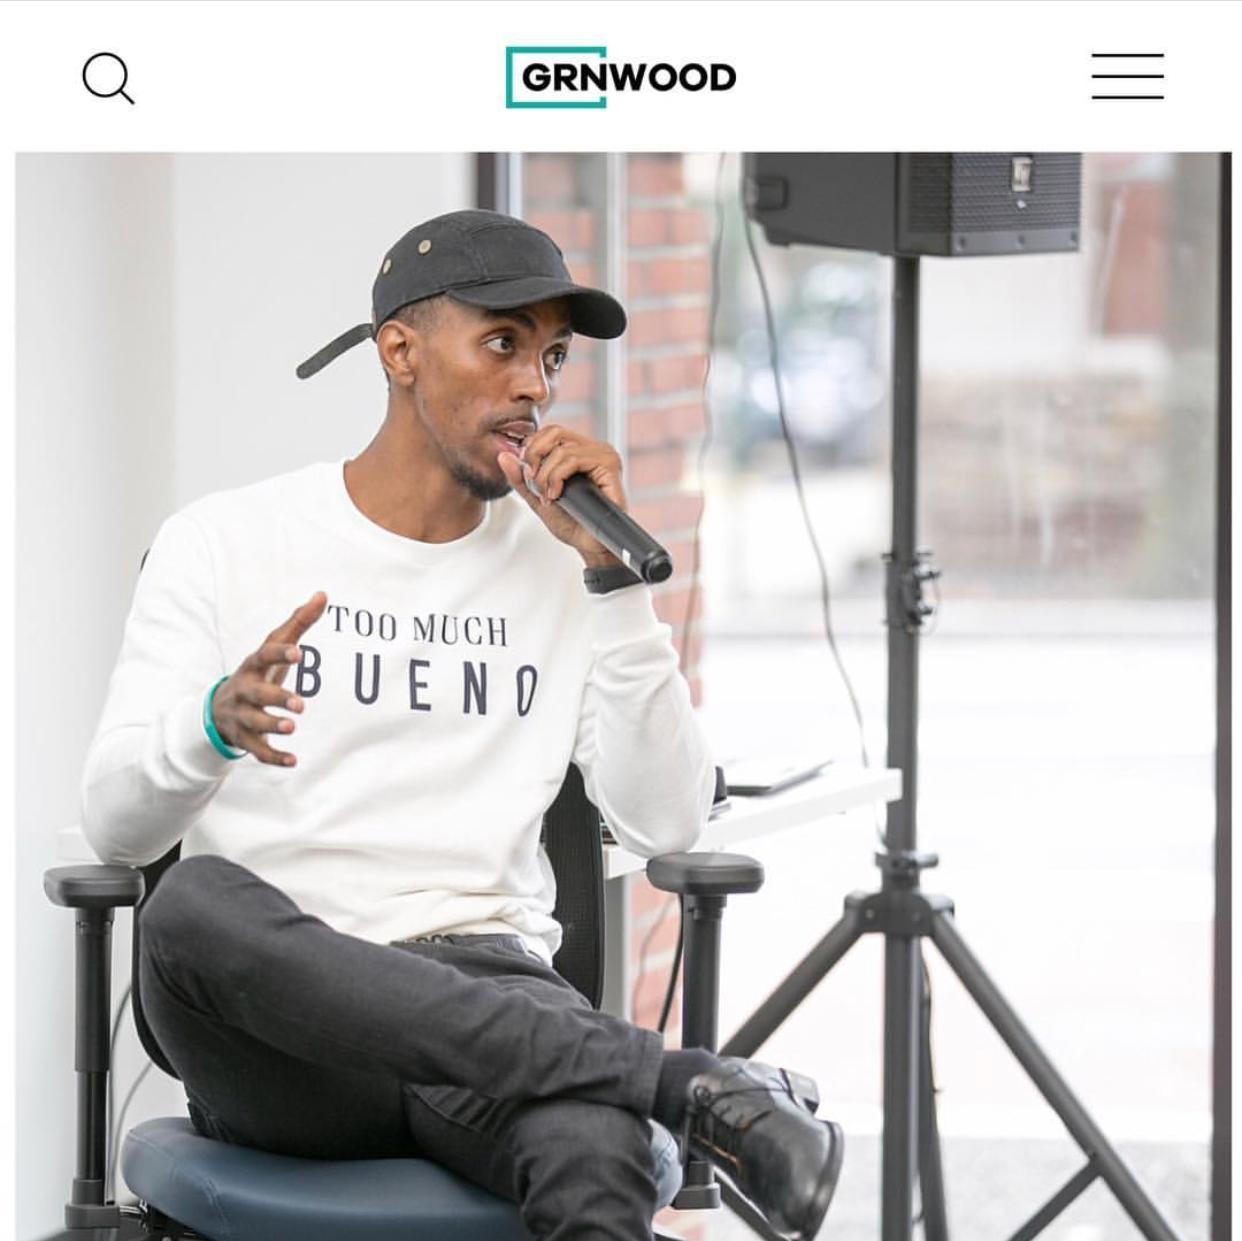 The Grnwood